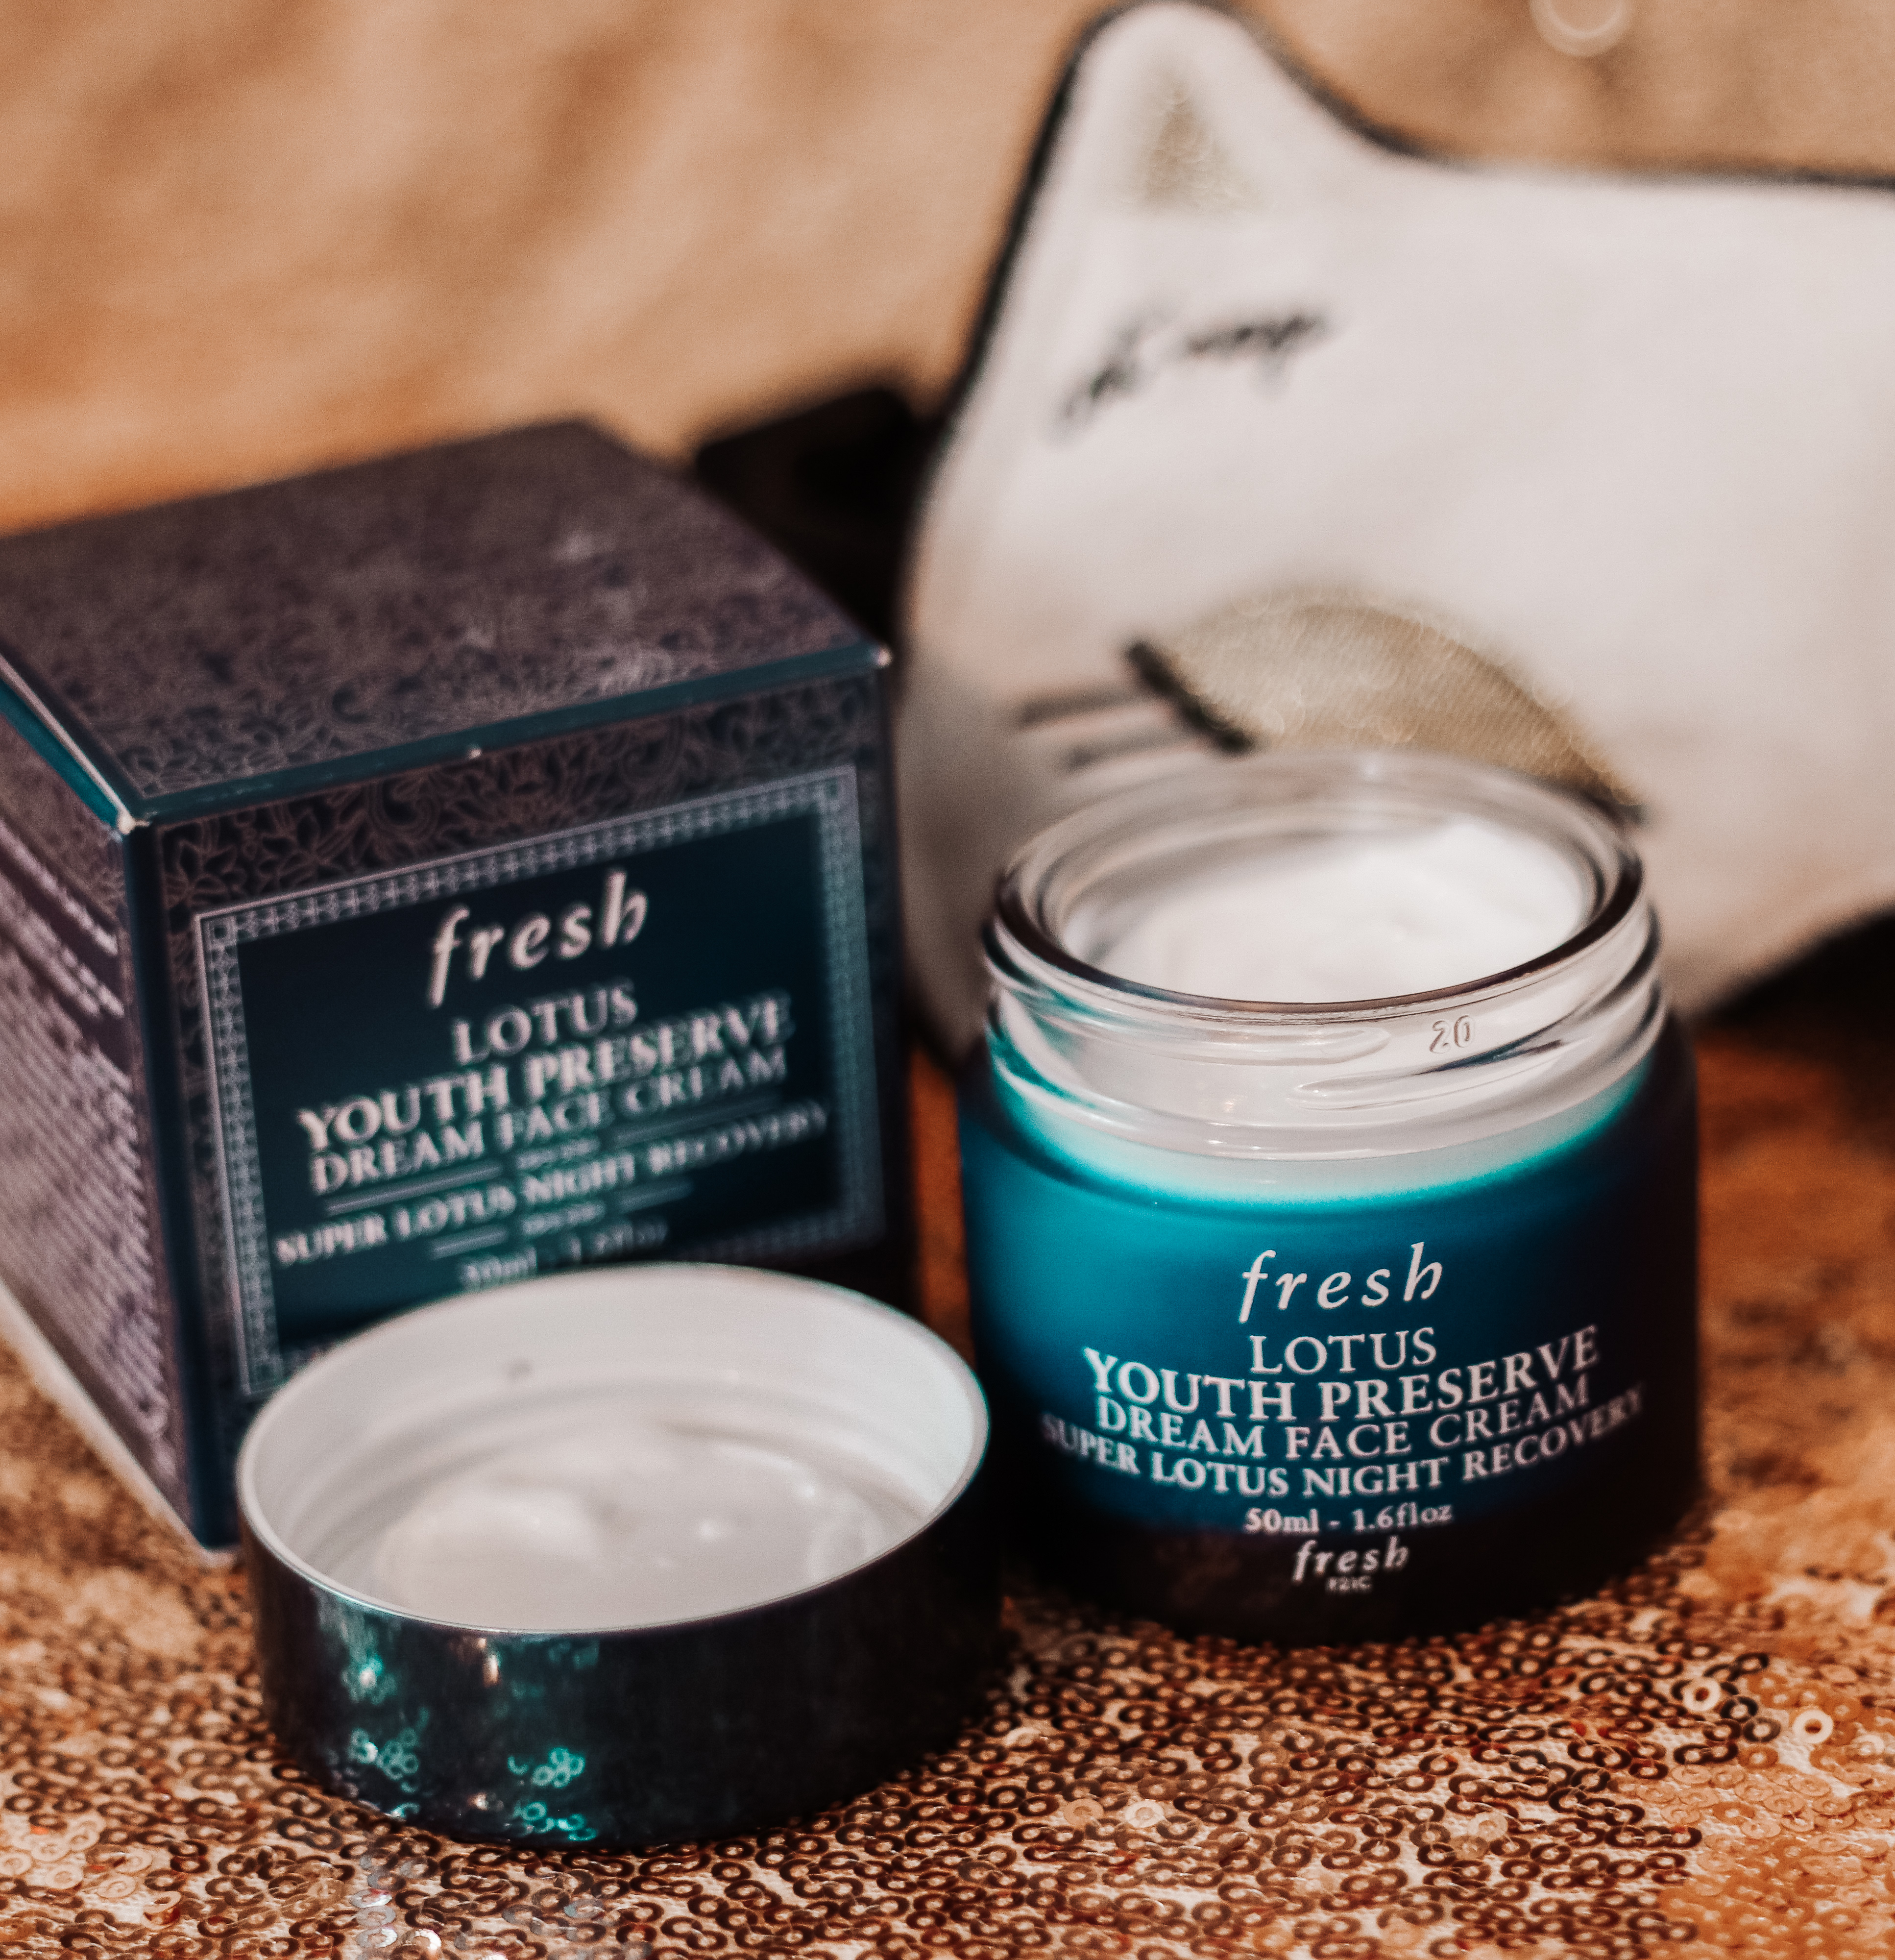 Fresh Lotus Youth Preserve Dream Face Cream 2